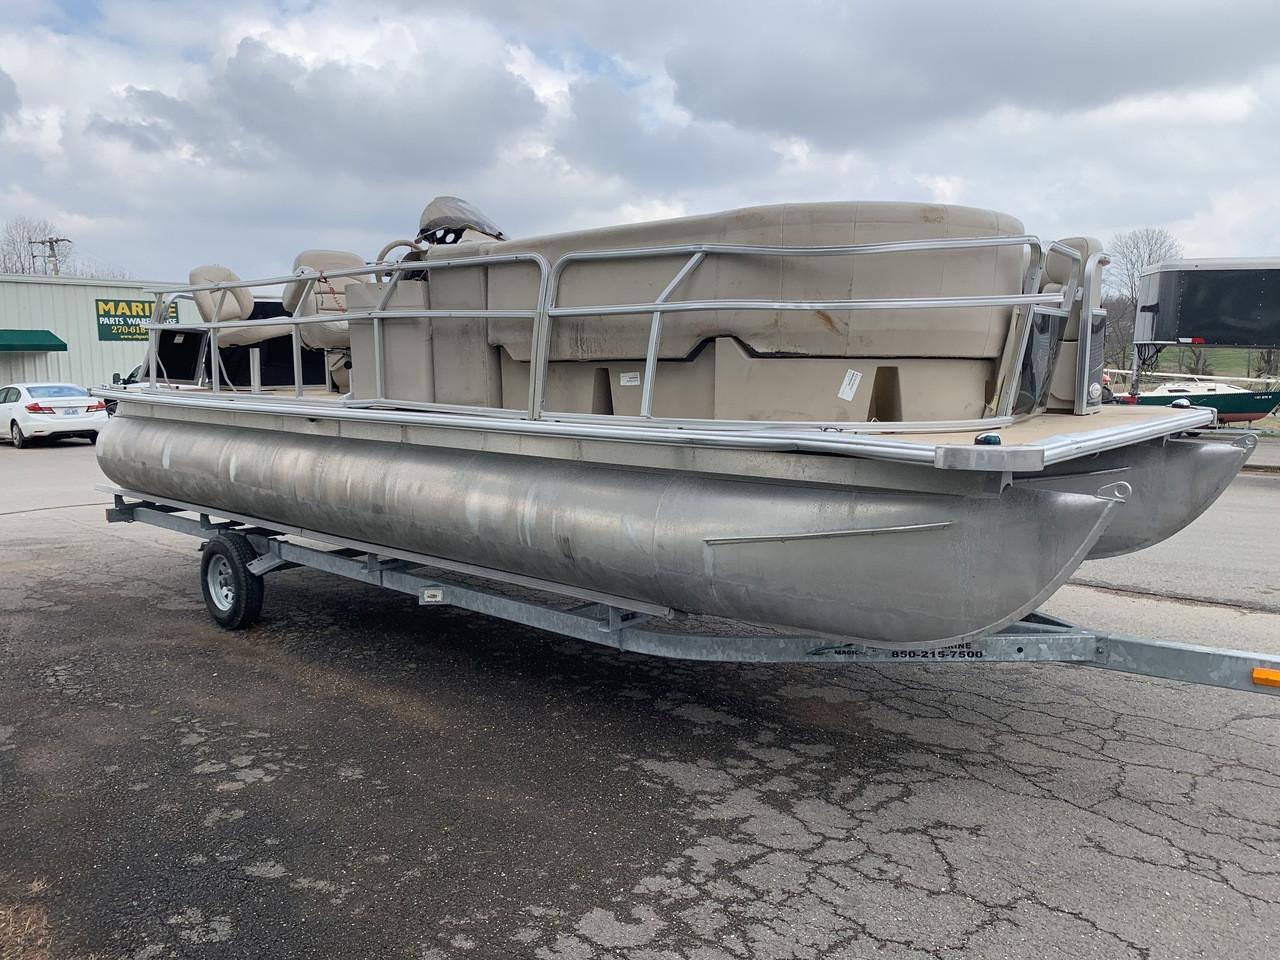 2012 SunChaser 8522 22' Aluminum Pontoon Boat with Trailer